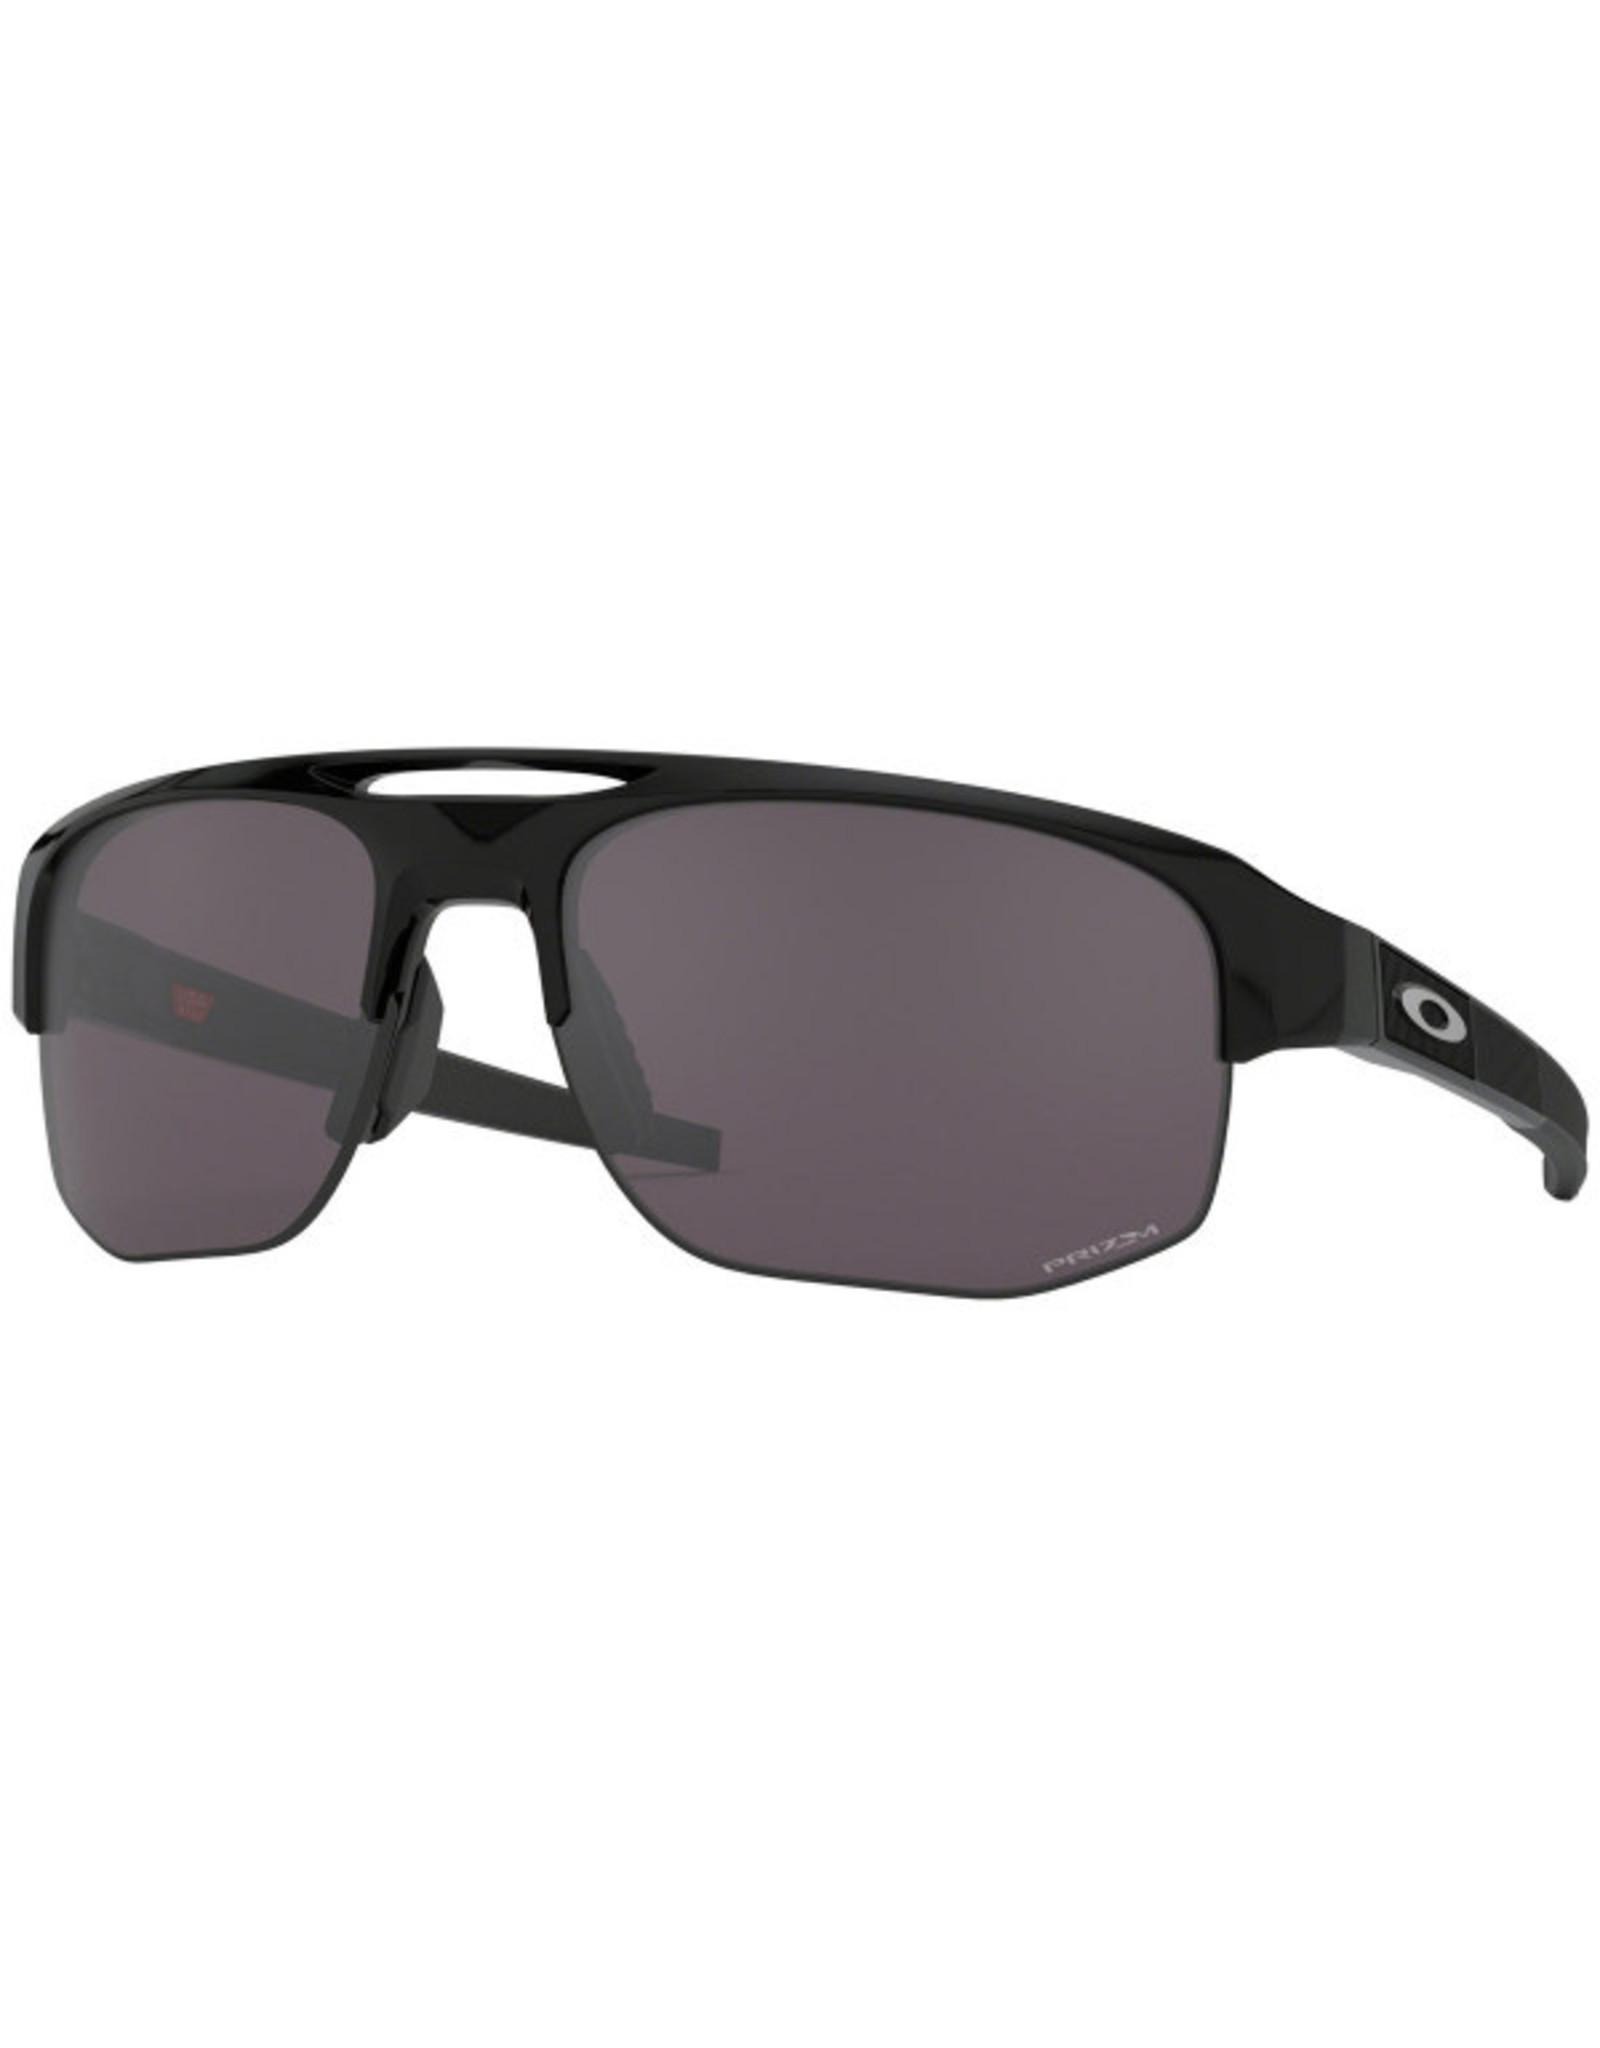 Oakley mens sunglasses MERCENARY polishes black w/ prizm grey